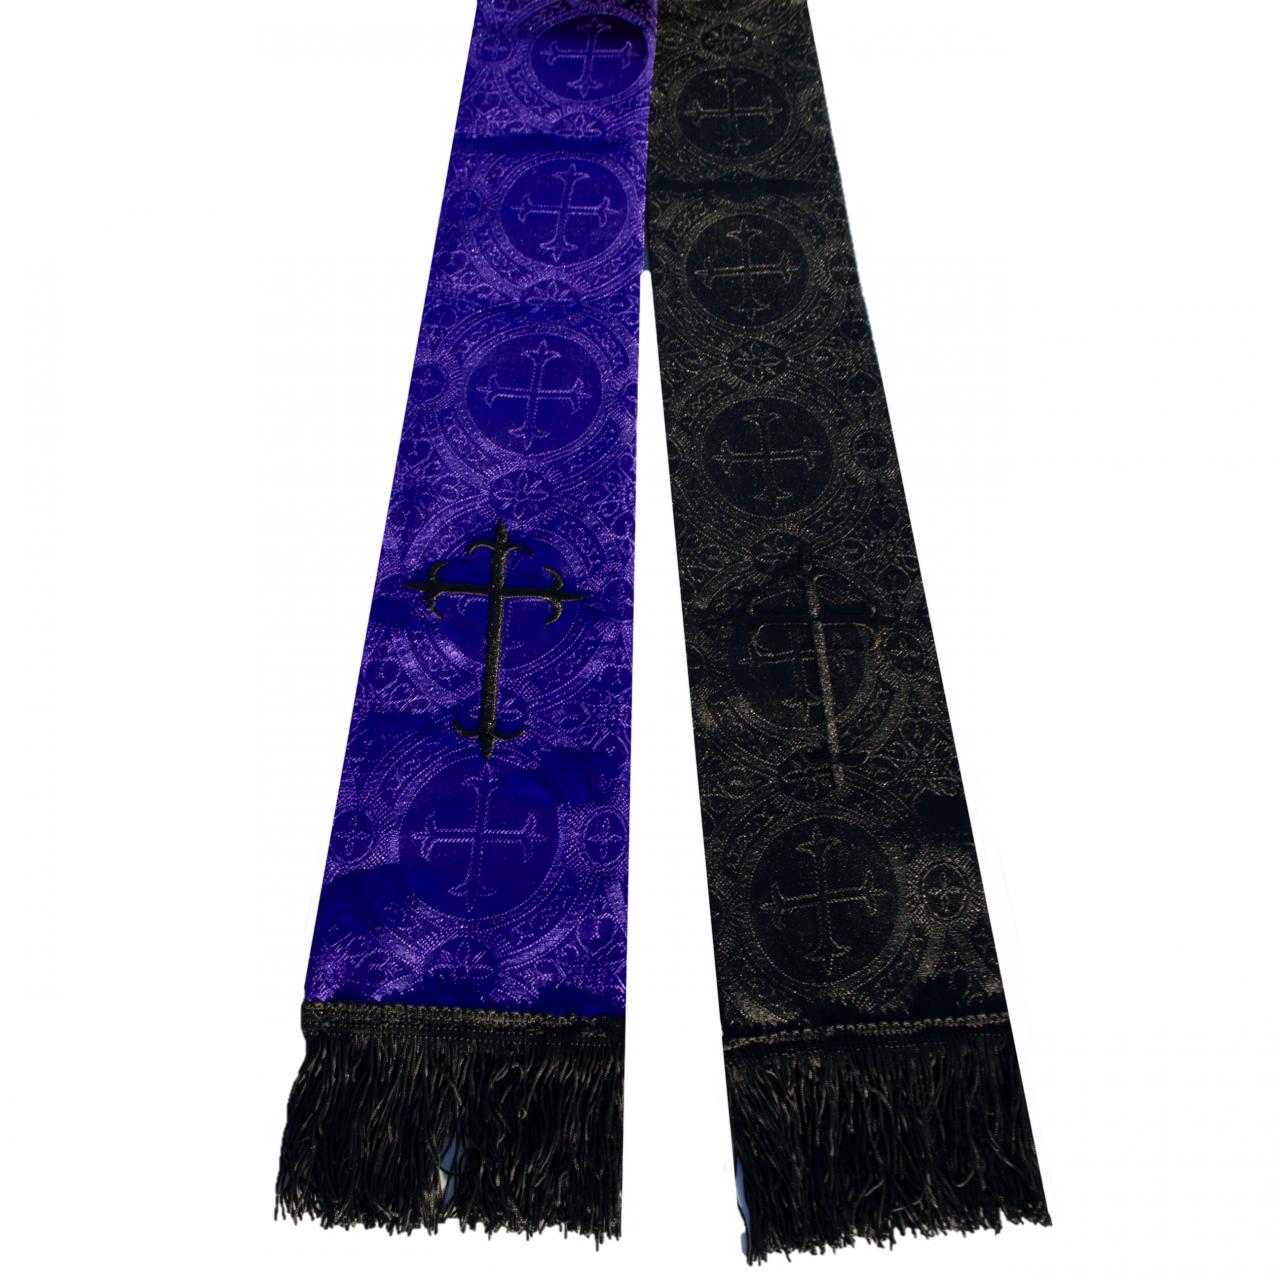 Premium Brocade Reversible Clergy Stole - Purple/Black